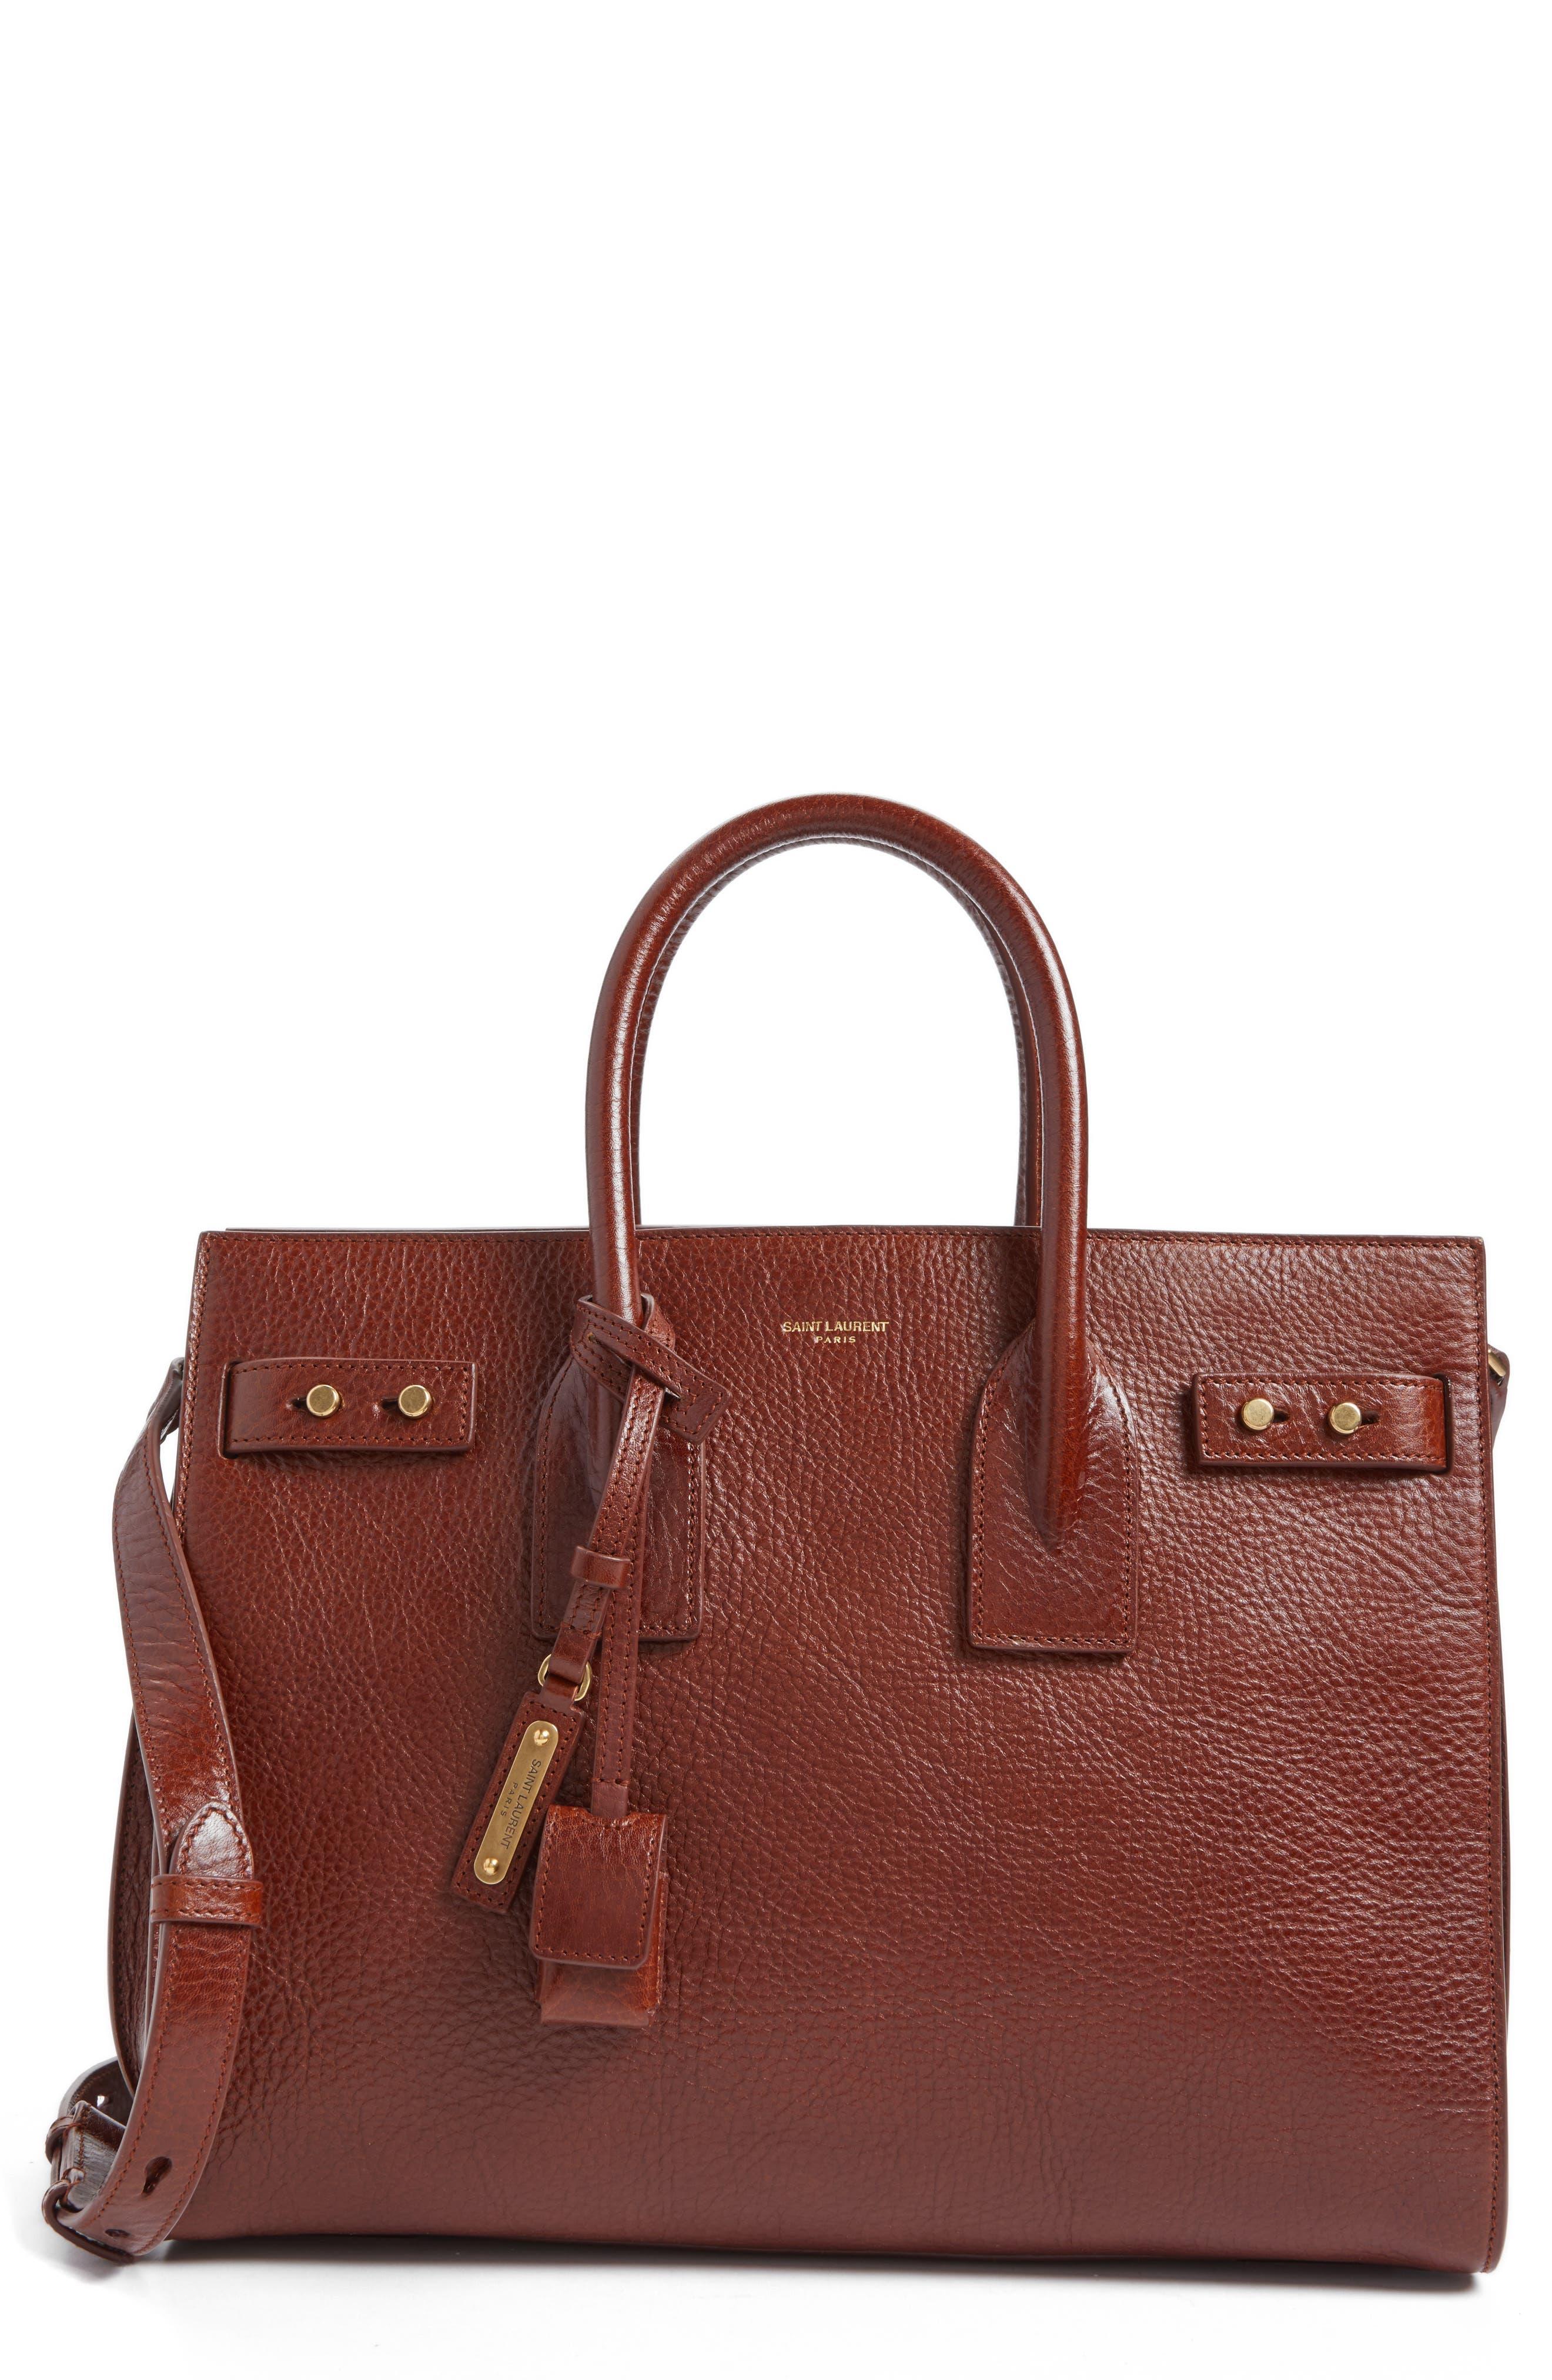 Small Sac de Jour Leather Tote,                         Main,                         color, 208